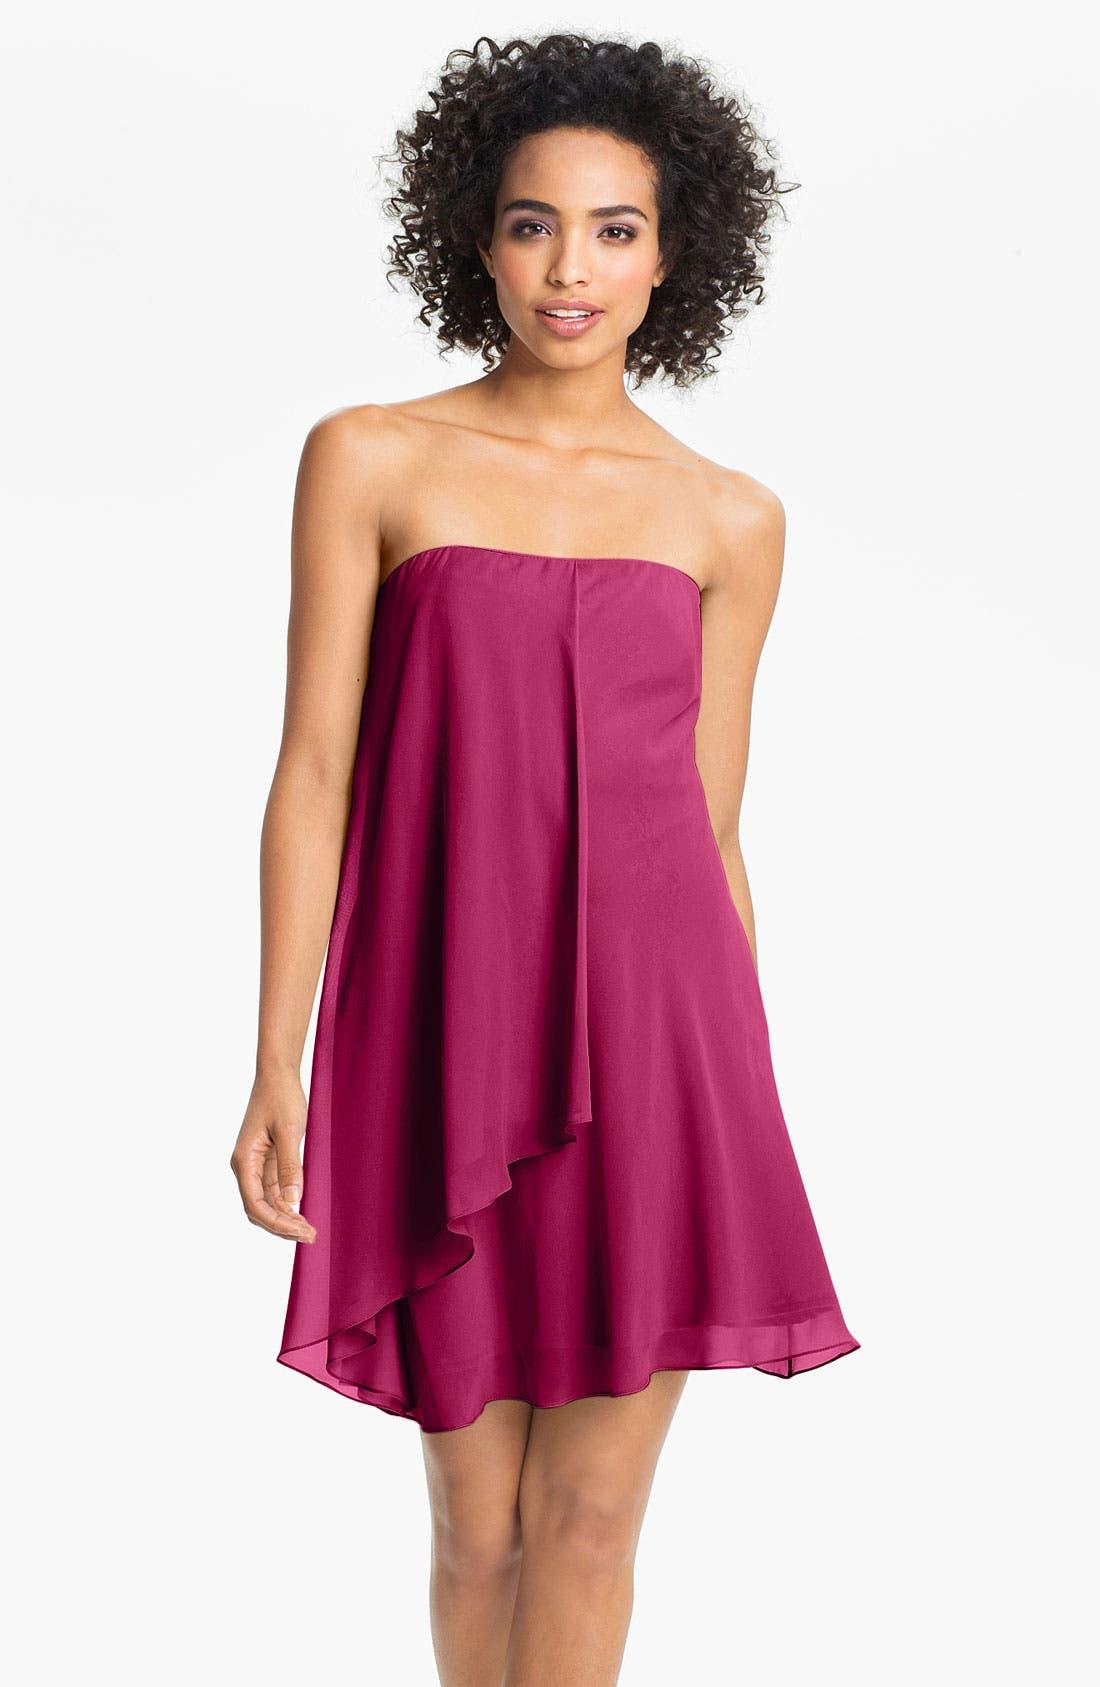 Main Image - Suzi Chin for Maggy Boutique Silk Chiffon Dress